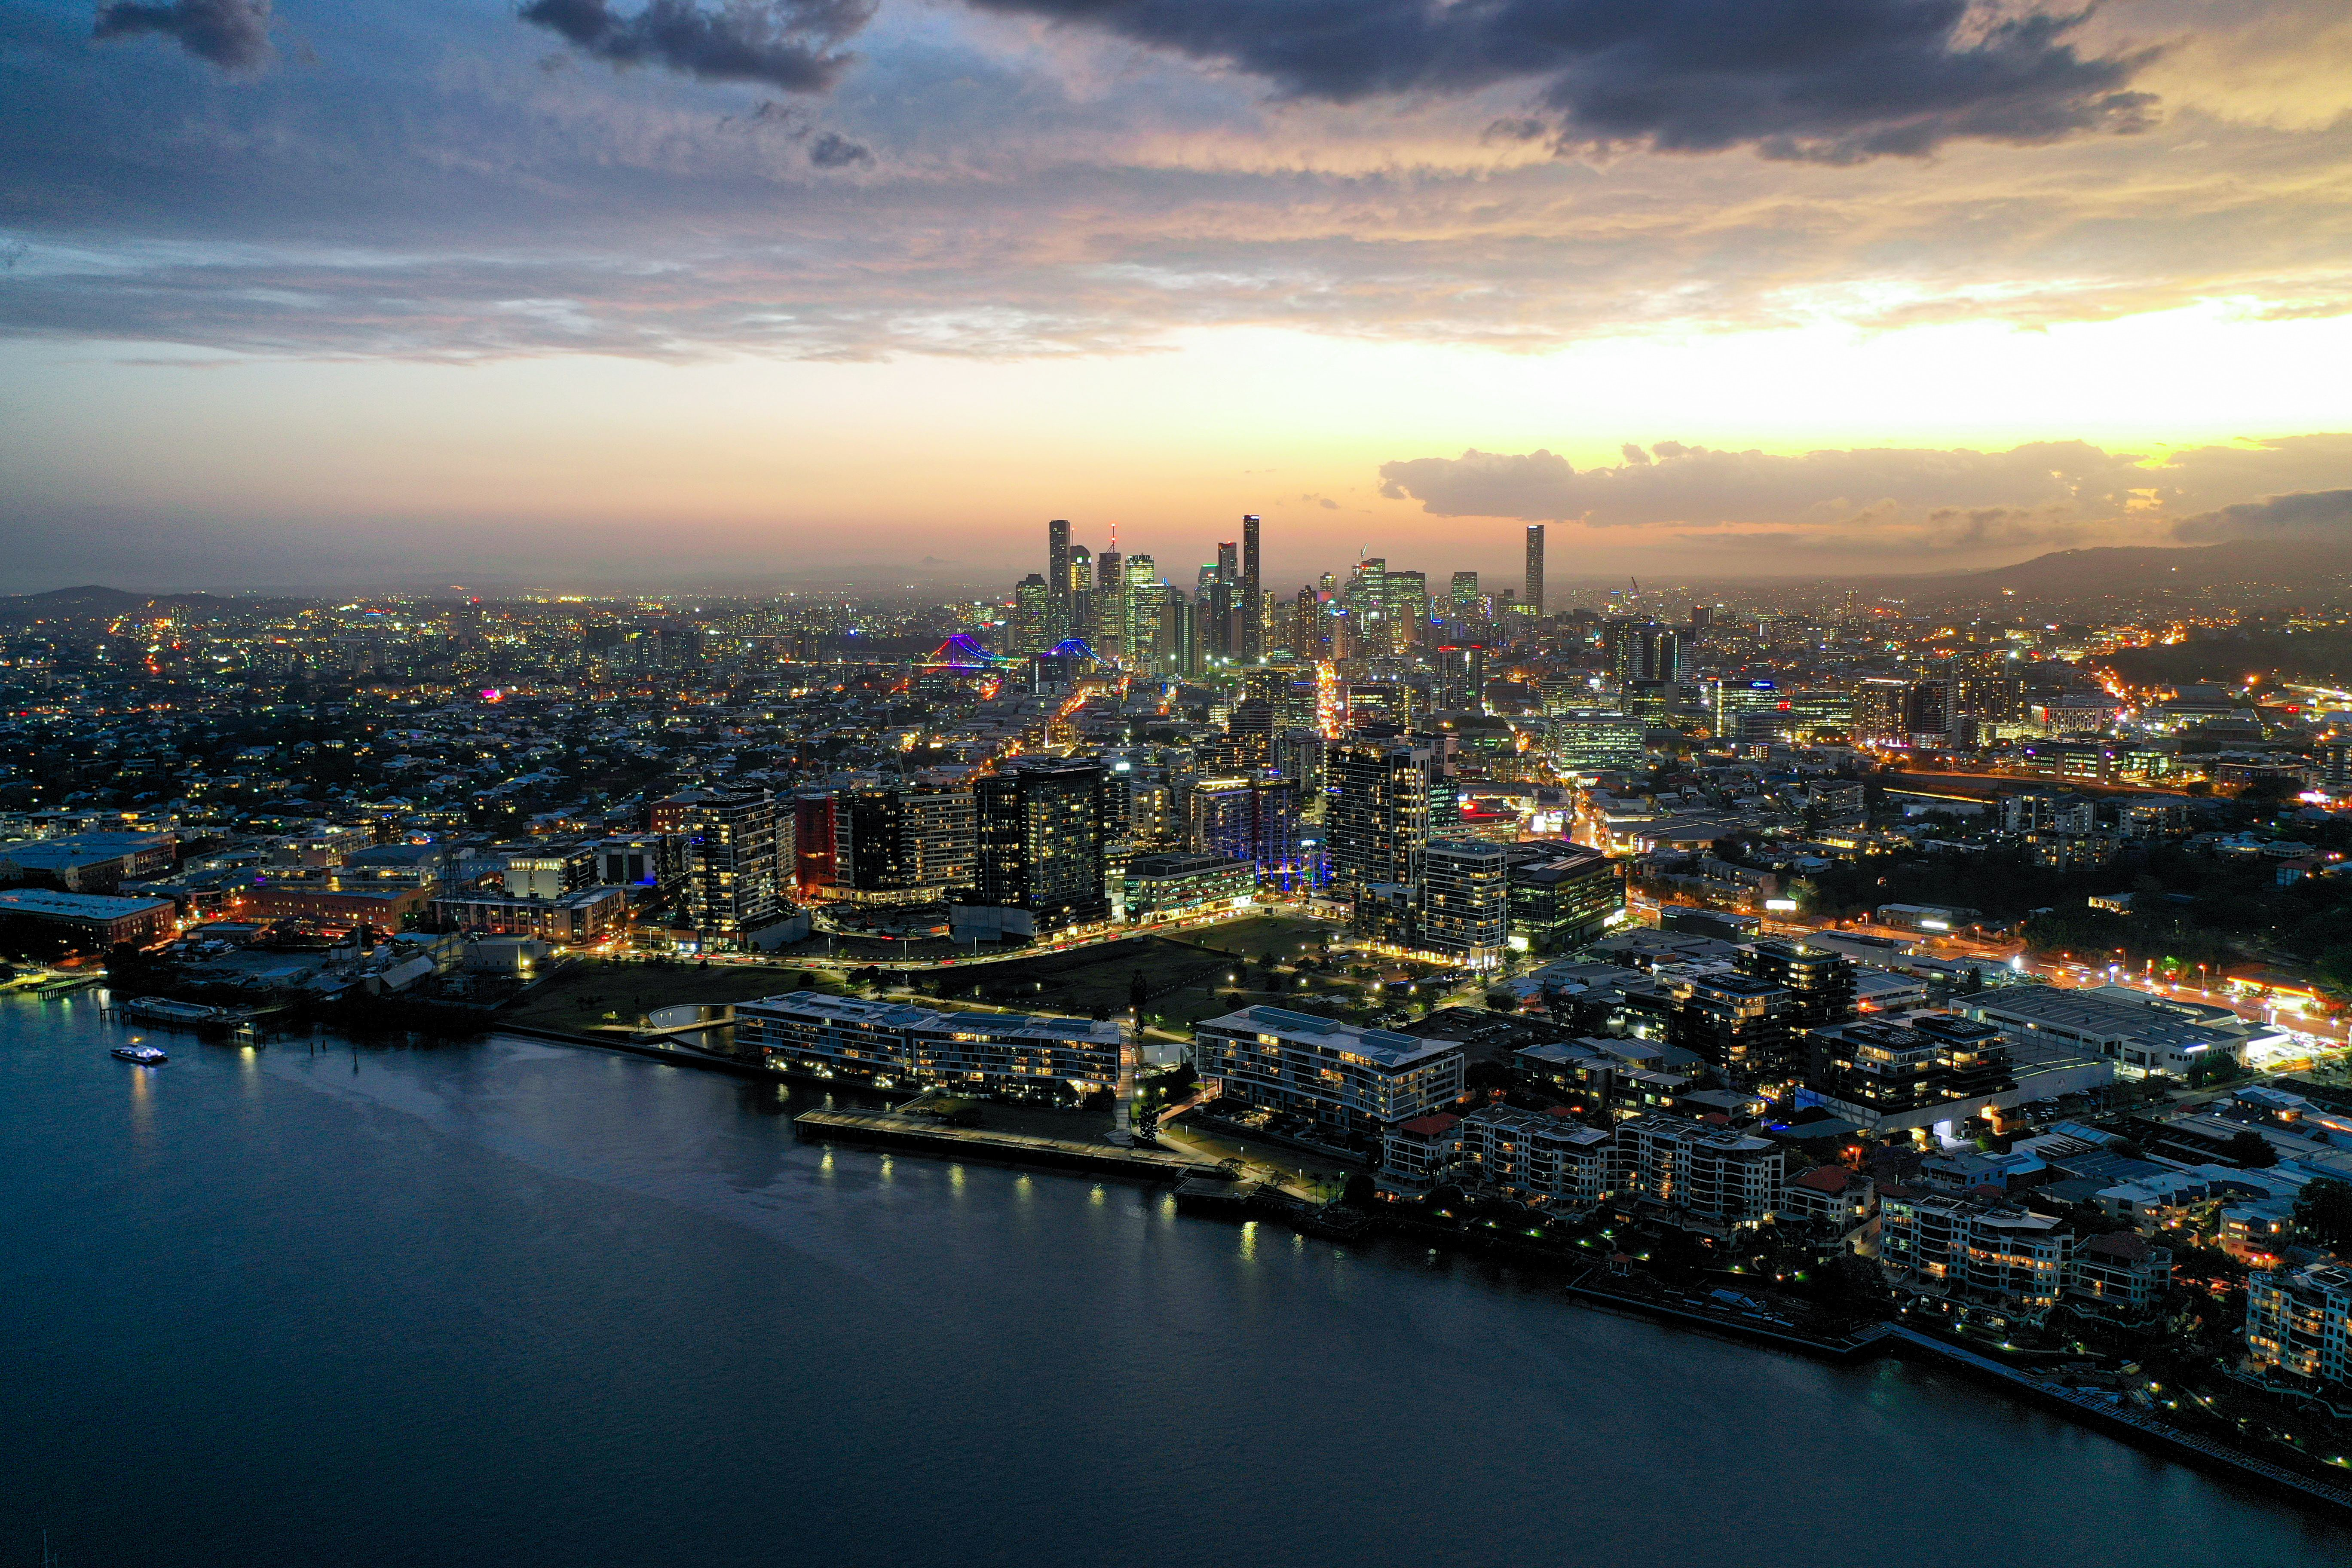 town building landscape aerial view 1574938340 - Town Building Landscape Aerial View -